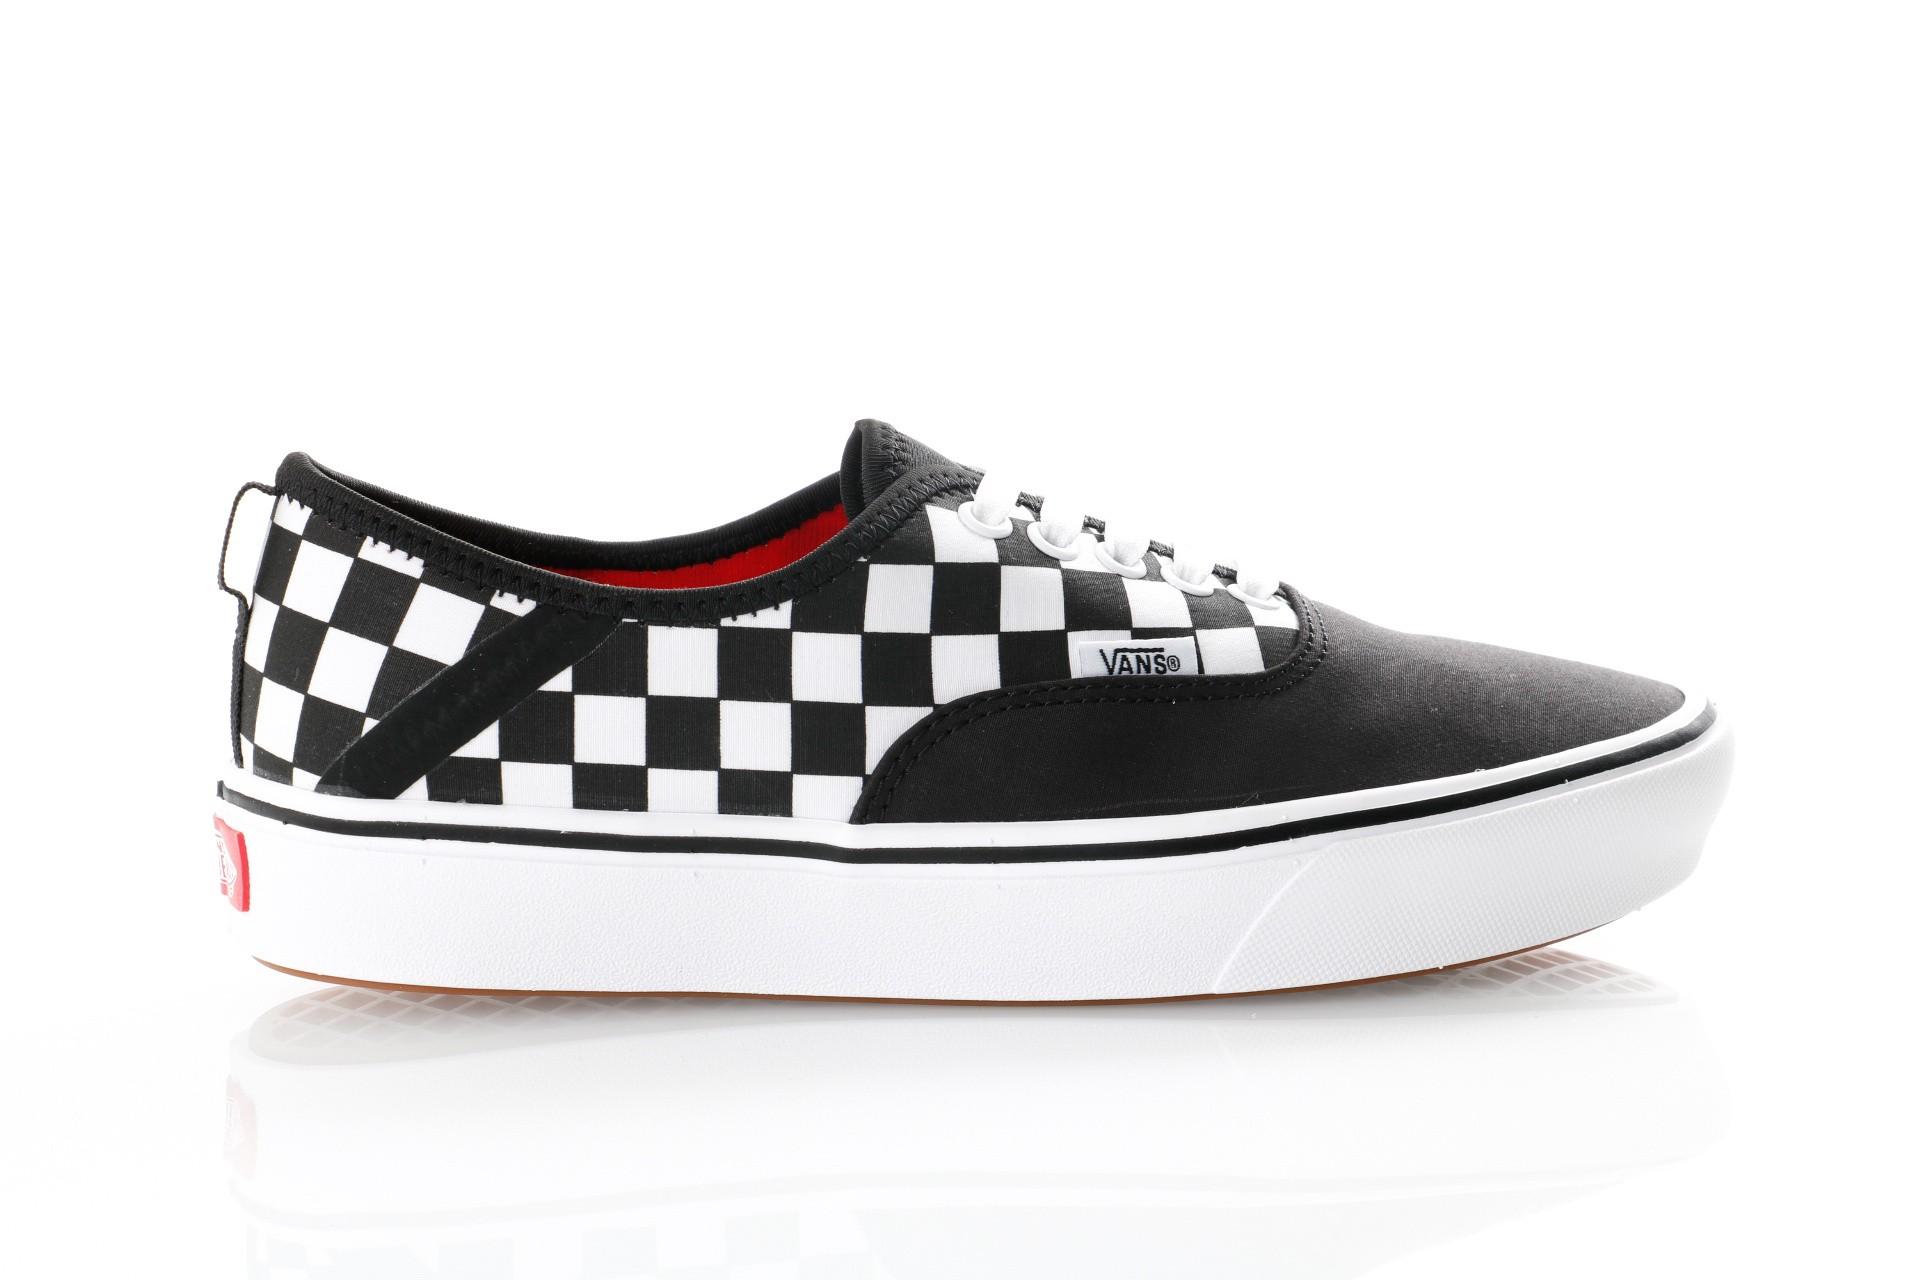 Foto van Vans UA ComfyCush Authentic SF VN0A3WM8VN8 Sneakers (2 tone) black/checkerboard